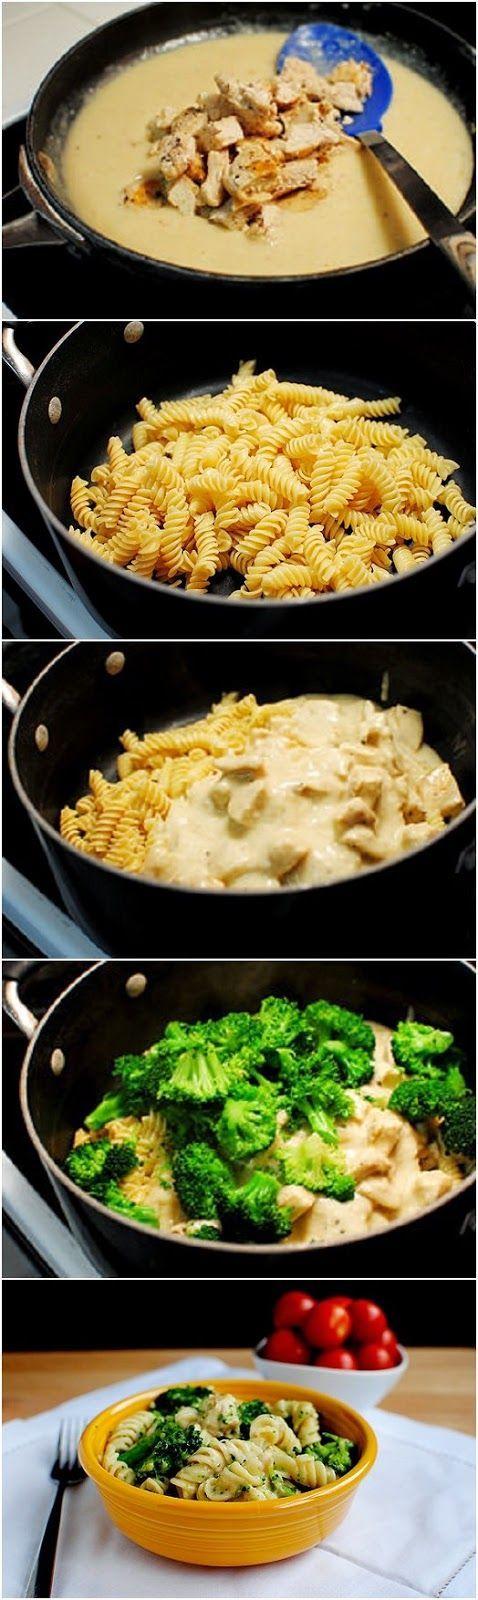 Skinny En And Broccoli Alfredo